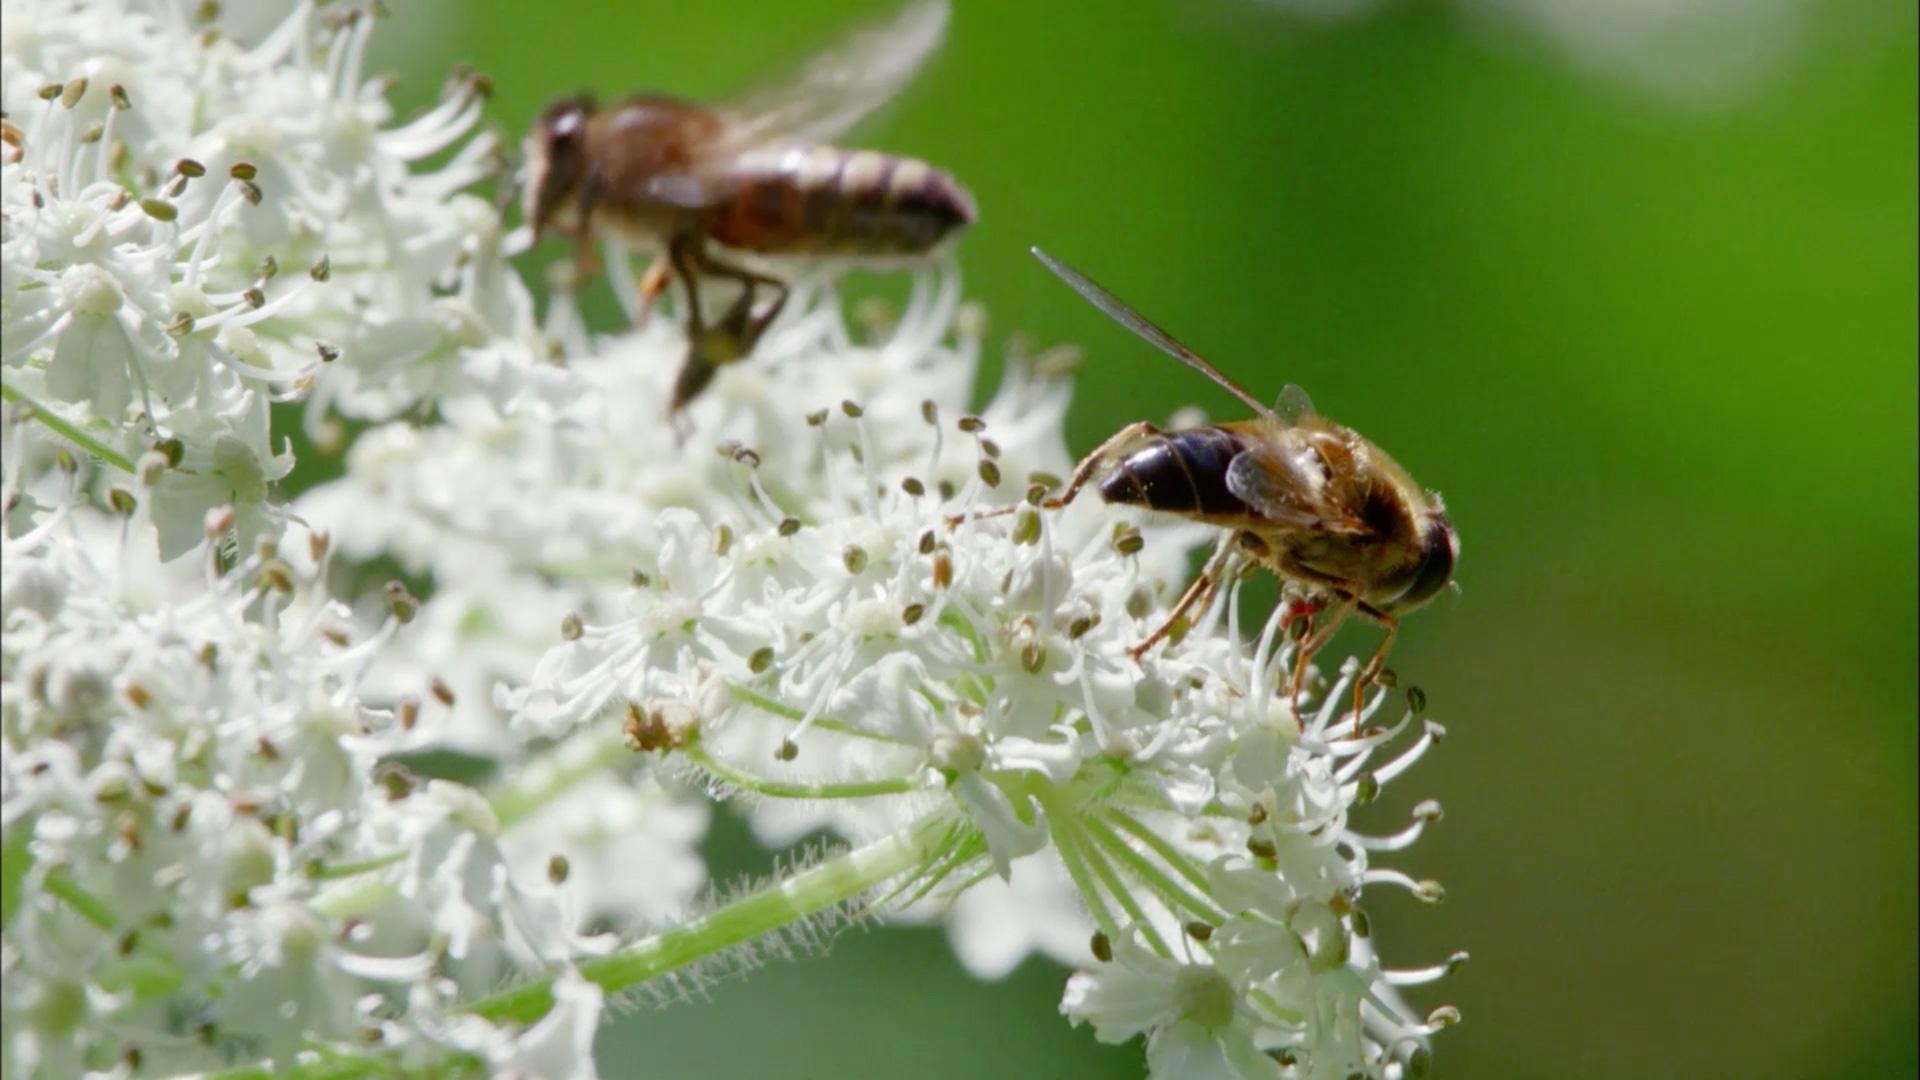 The Queen's Bees